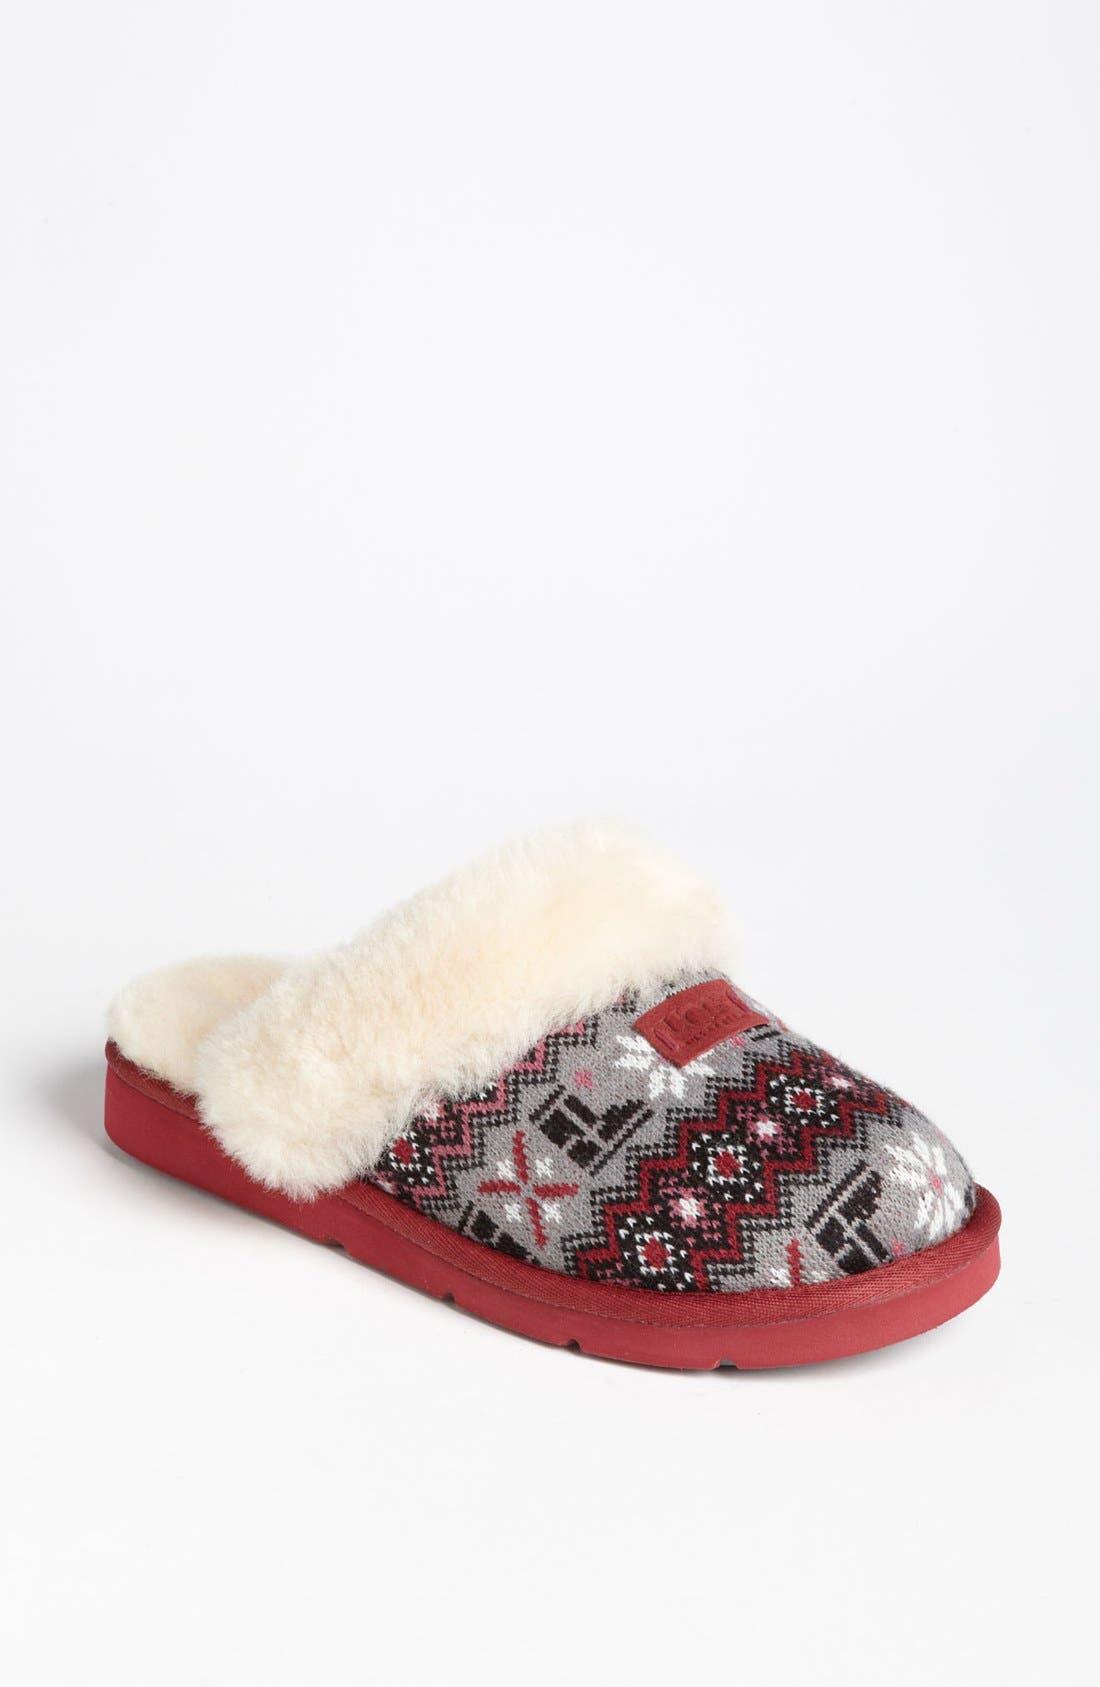 Alternate Image 1 Selected - UGG® Australia 'Cozy Nordic Knit' Slipper (Women)